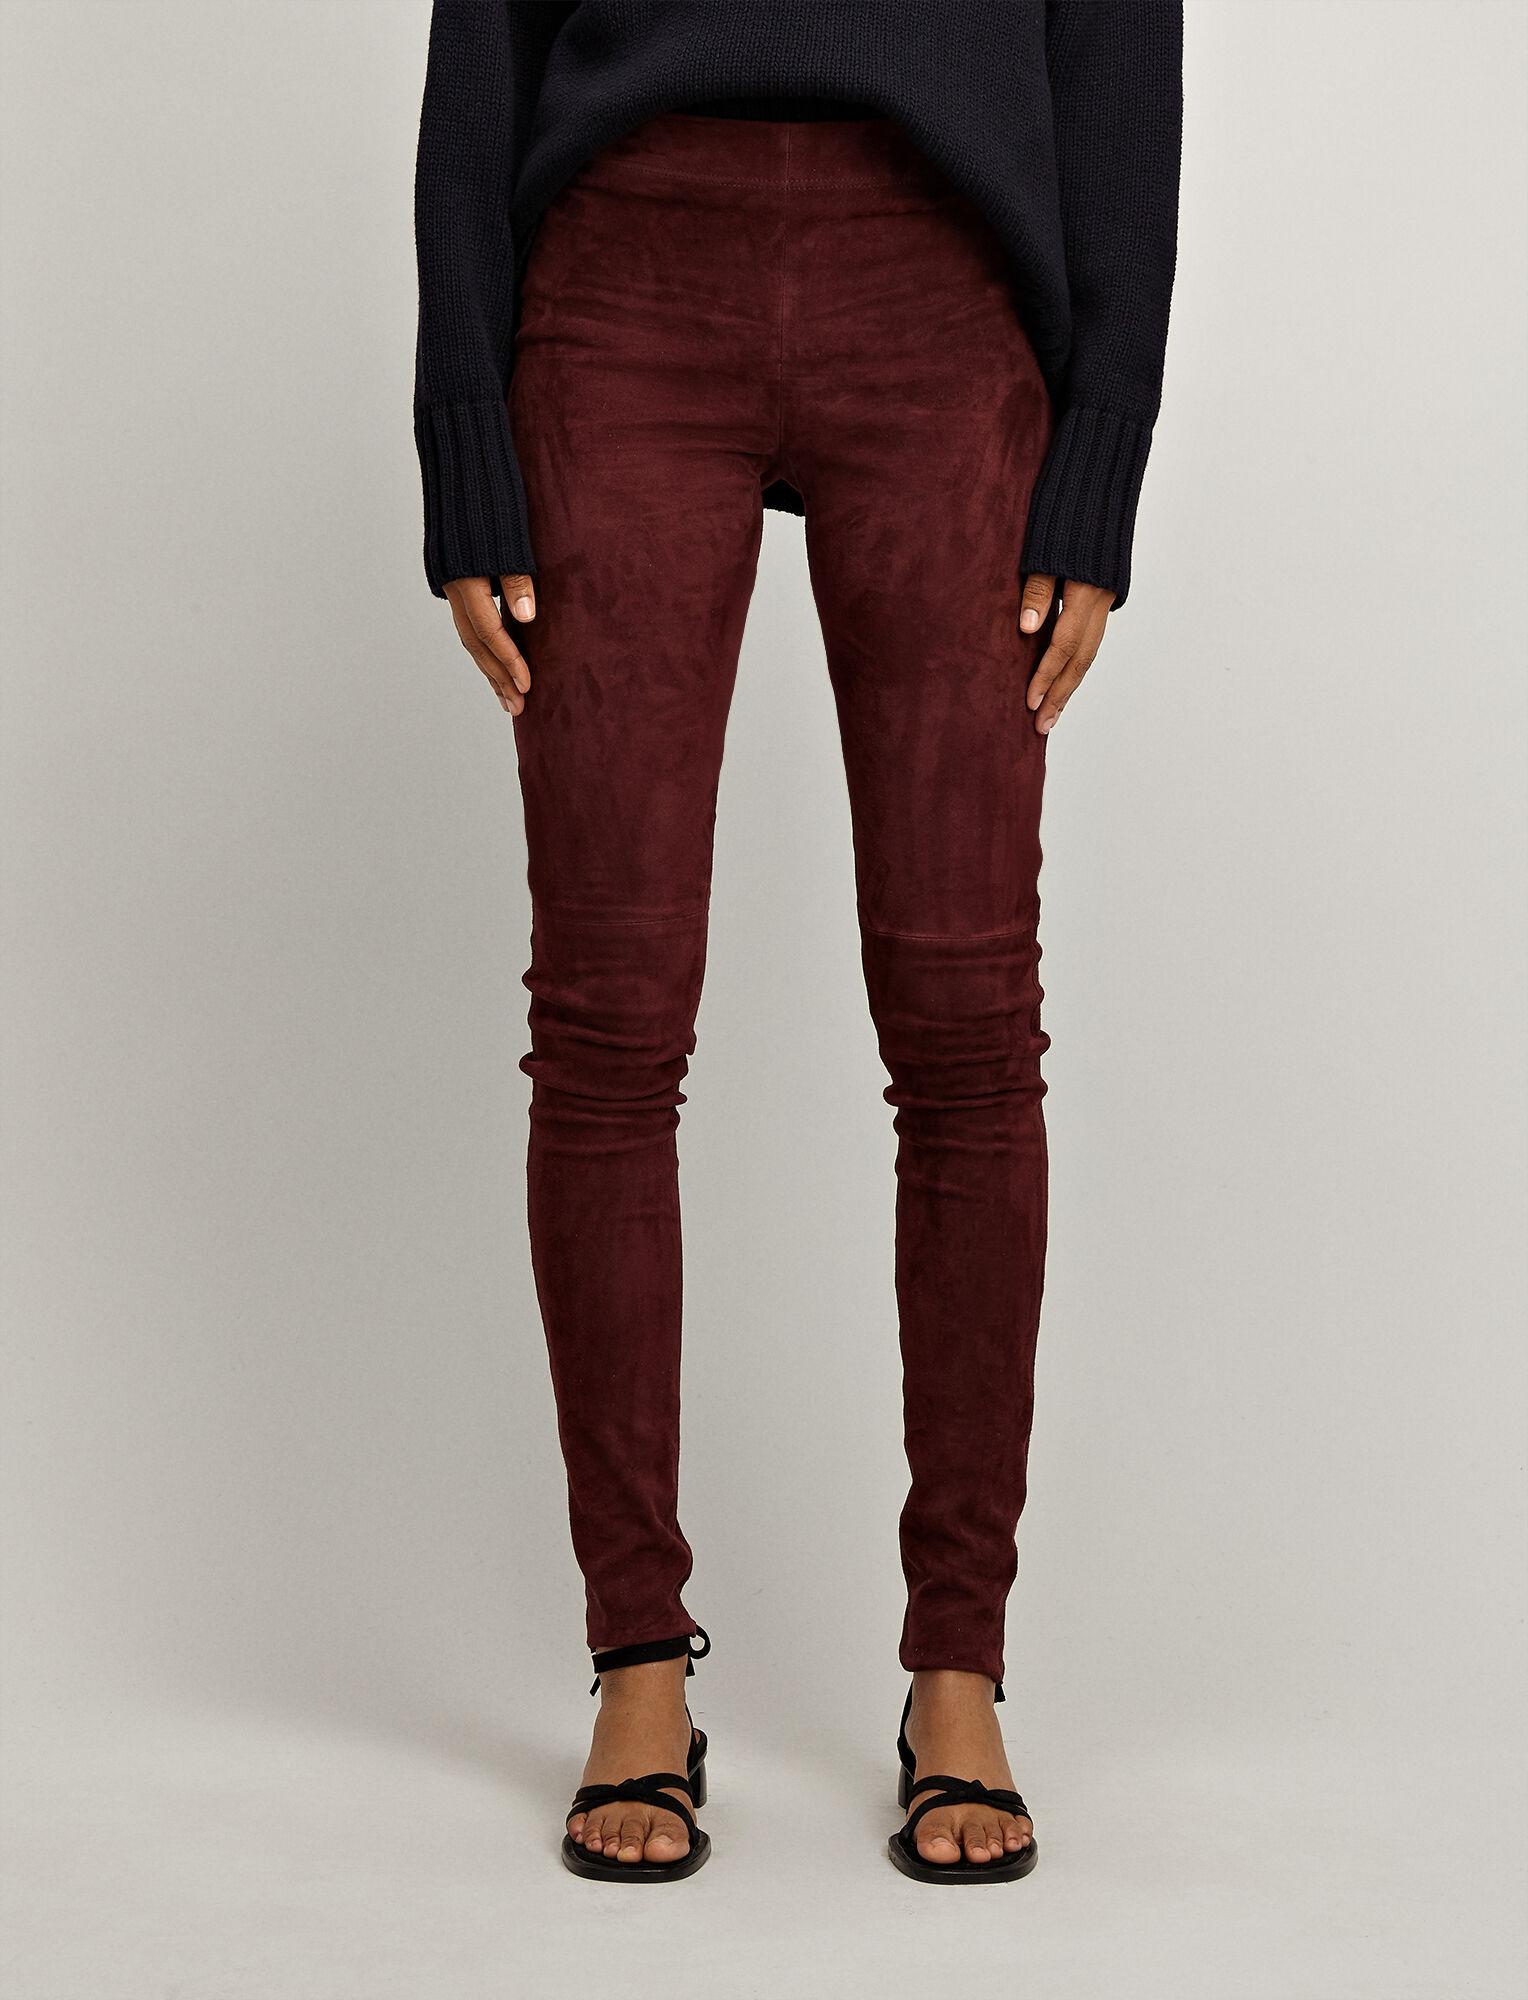 Pantalon De Style Legging - Brun Joseph Z9NwxgkxCF